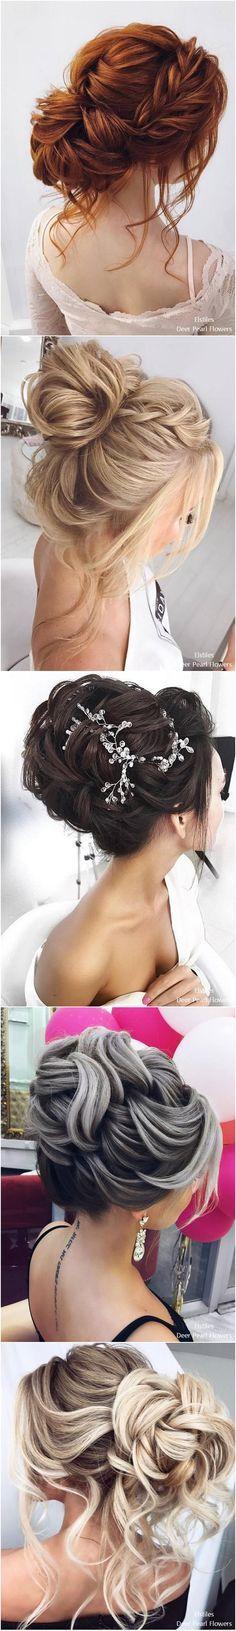 bridal updos. bridal hair. hairstyles. braids. #bridalhair #hairstyle #bridalupdo